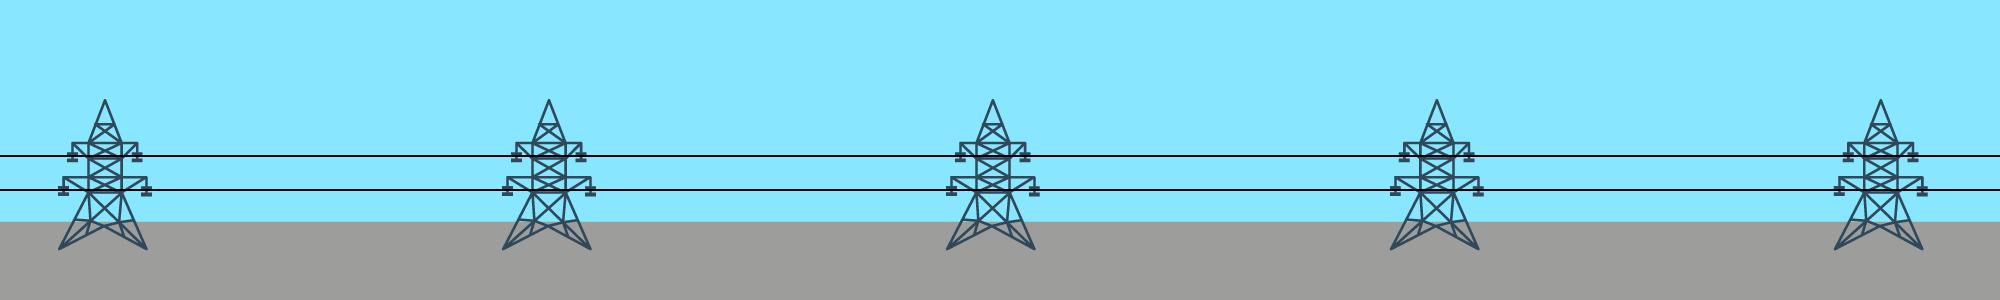 Electricity company pension